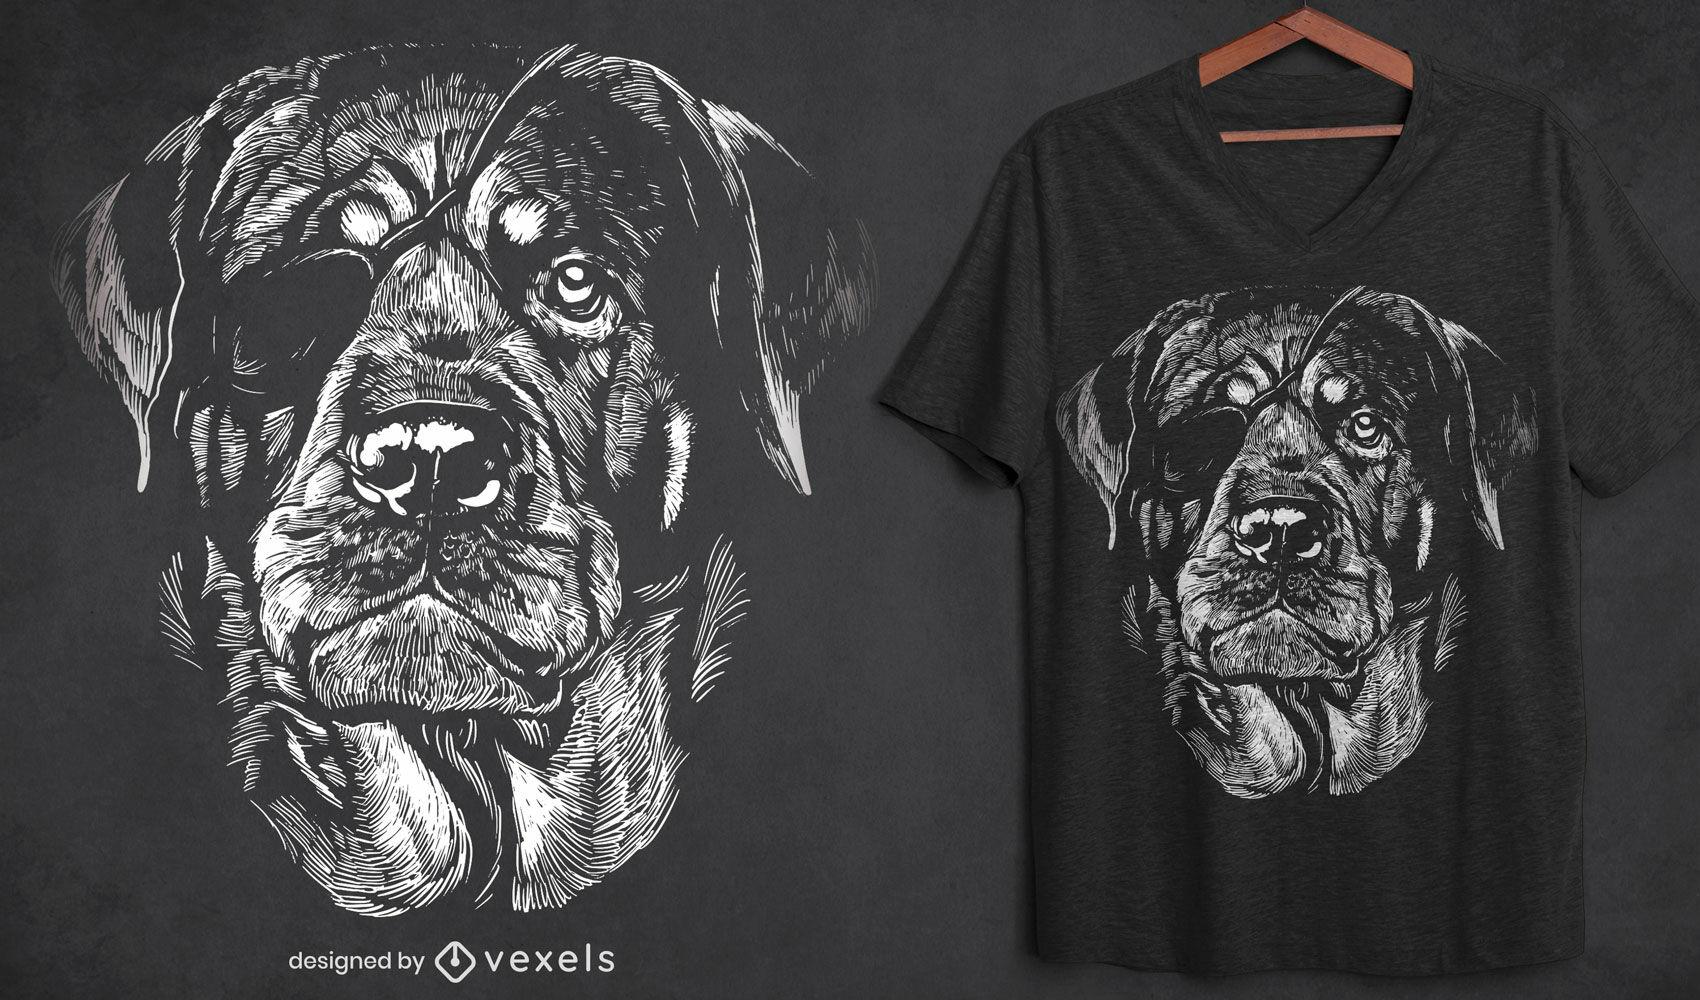 Rottweiler dog with eyepatch t-shirt design